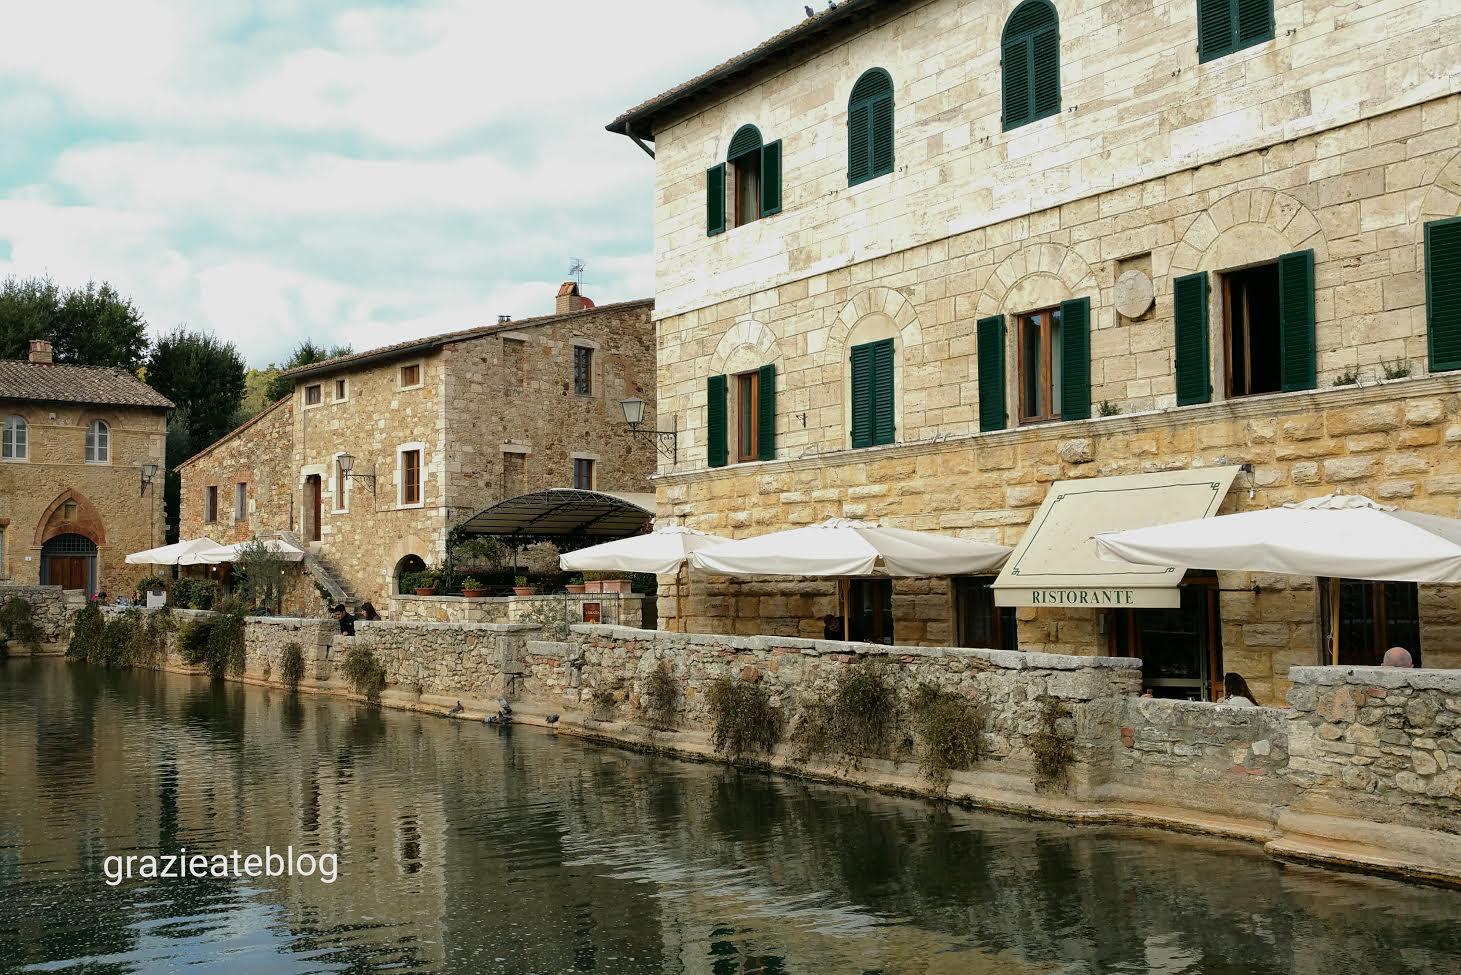 Grazie a te o burgo de bagno vignoni famoso por suas termas - Piscina bagno vignoni ...